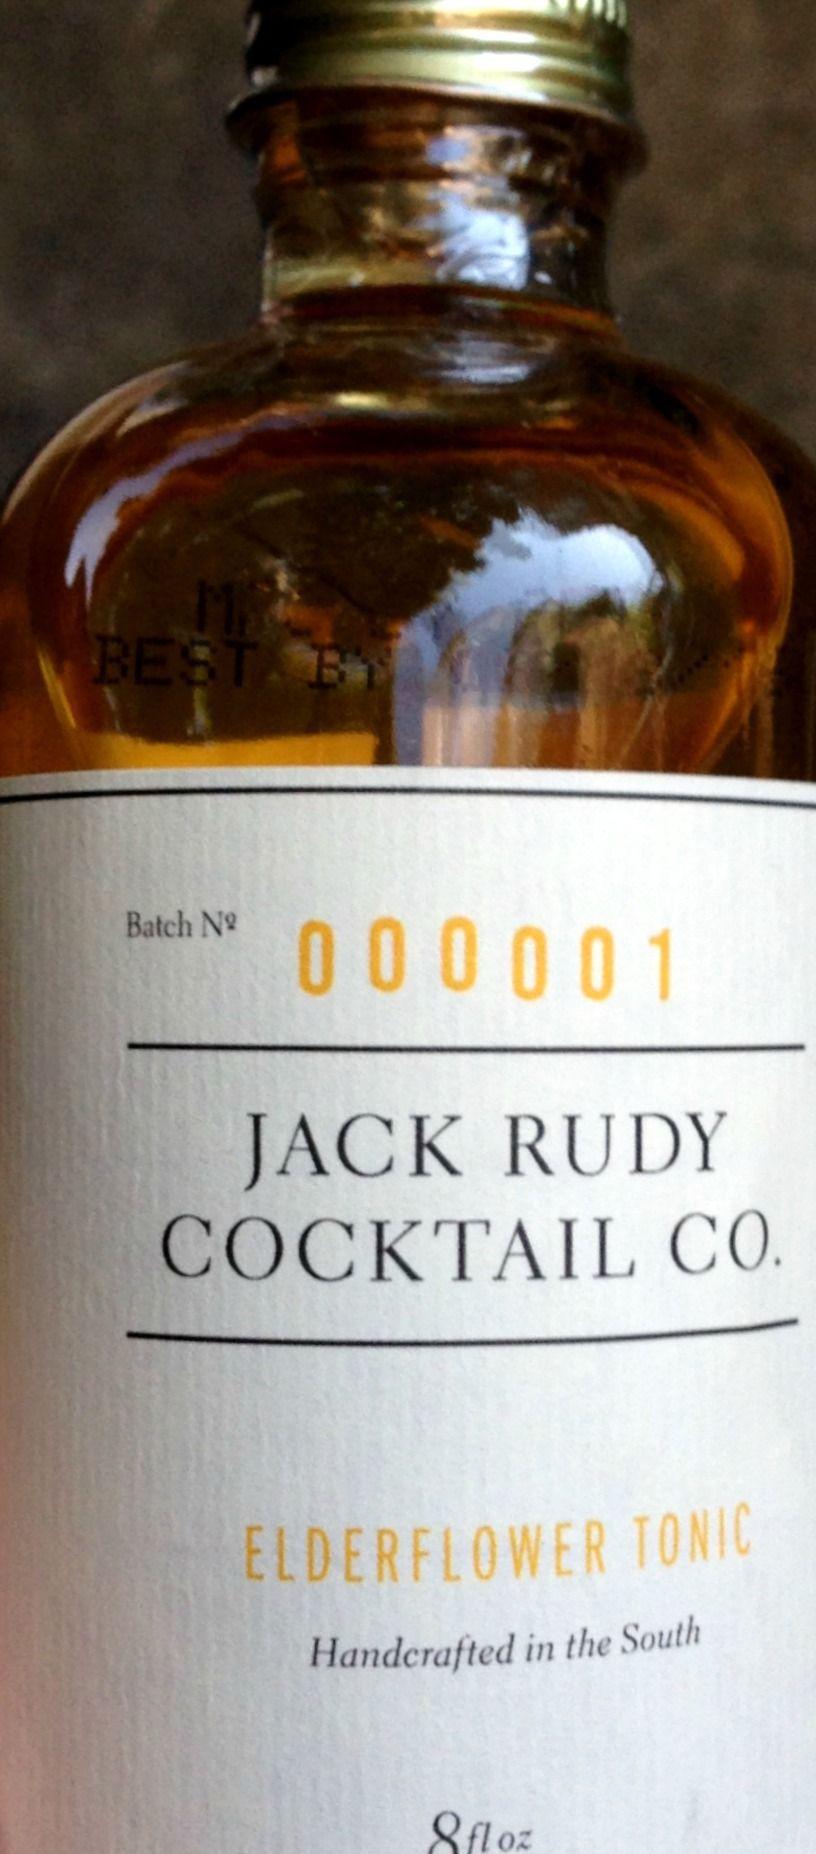 Jack Rudy Cocktail Co. releases elderflower tonic